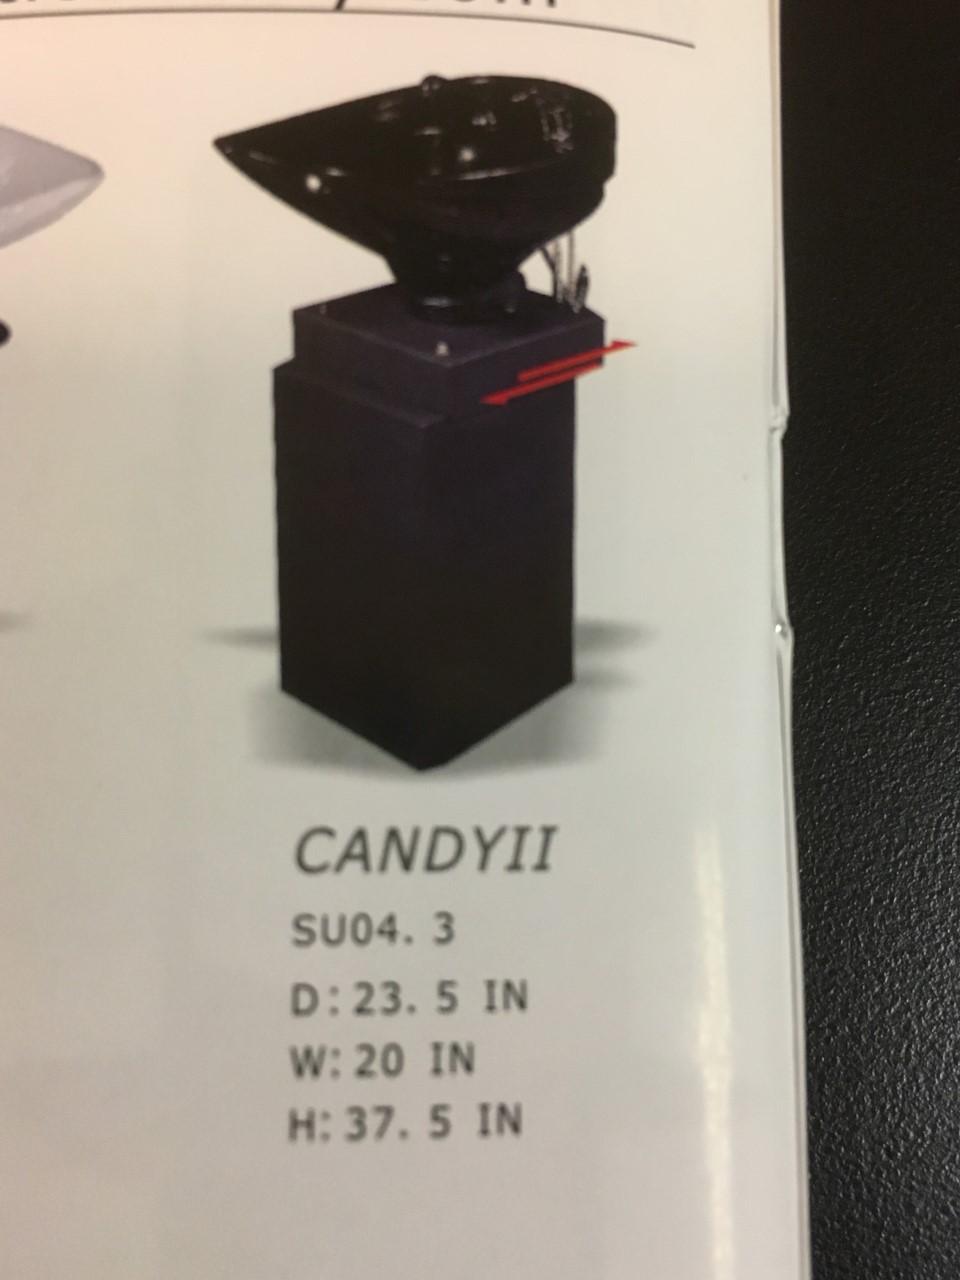 Mac - Candy II Sliding Basin Pedestal Shampoo Bowl Unit